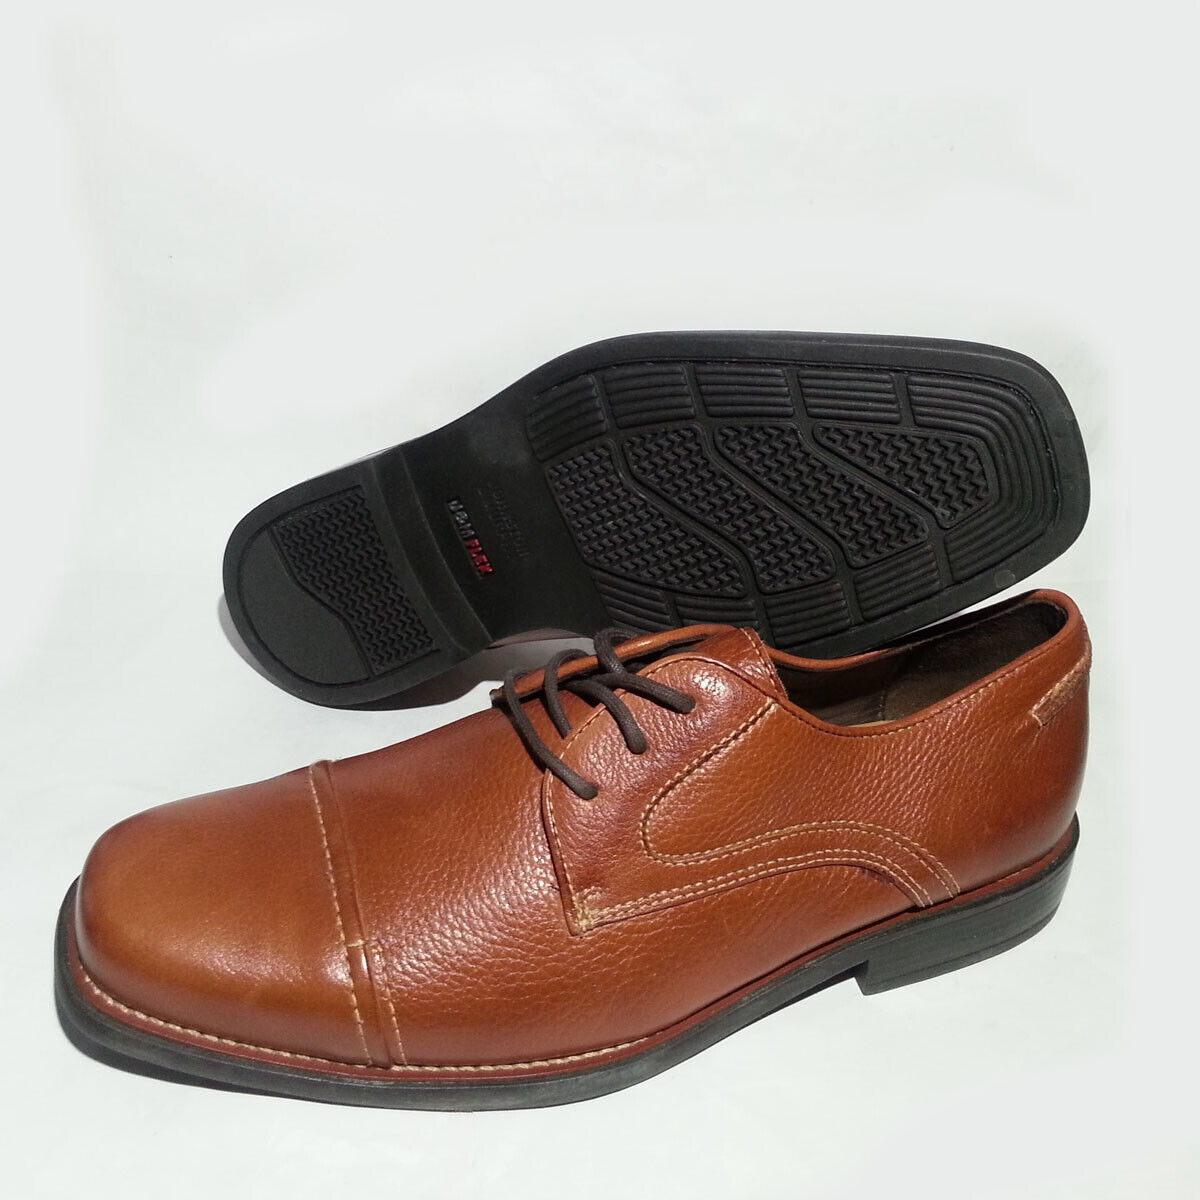 JohnstonΜrphy Flex Men Size 8 Cap Toe Tan Brown Sheepskin Oxford shoes Brazil